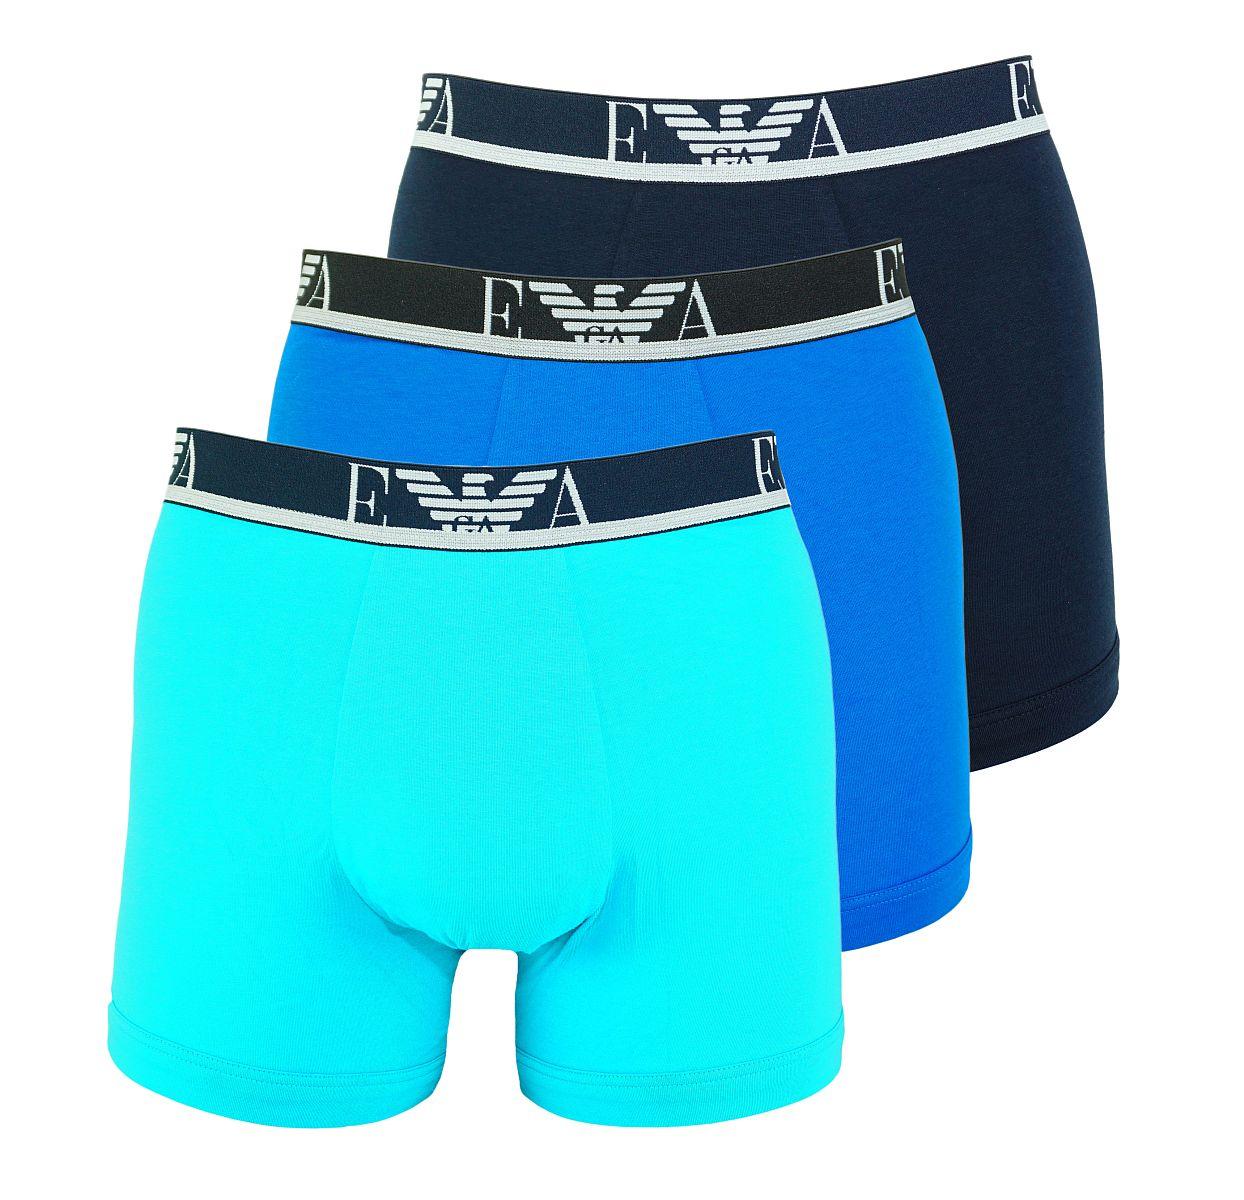 Emporio Armani 3er Pack Shorts Boxer Unterhose 111473 8P715 12583 TURCHES/MARINE/CIELO W18-EABZ1